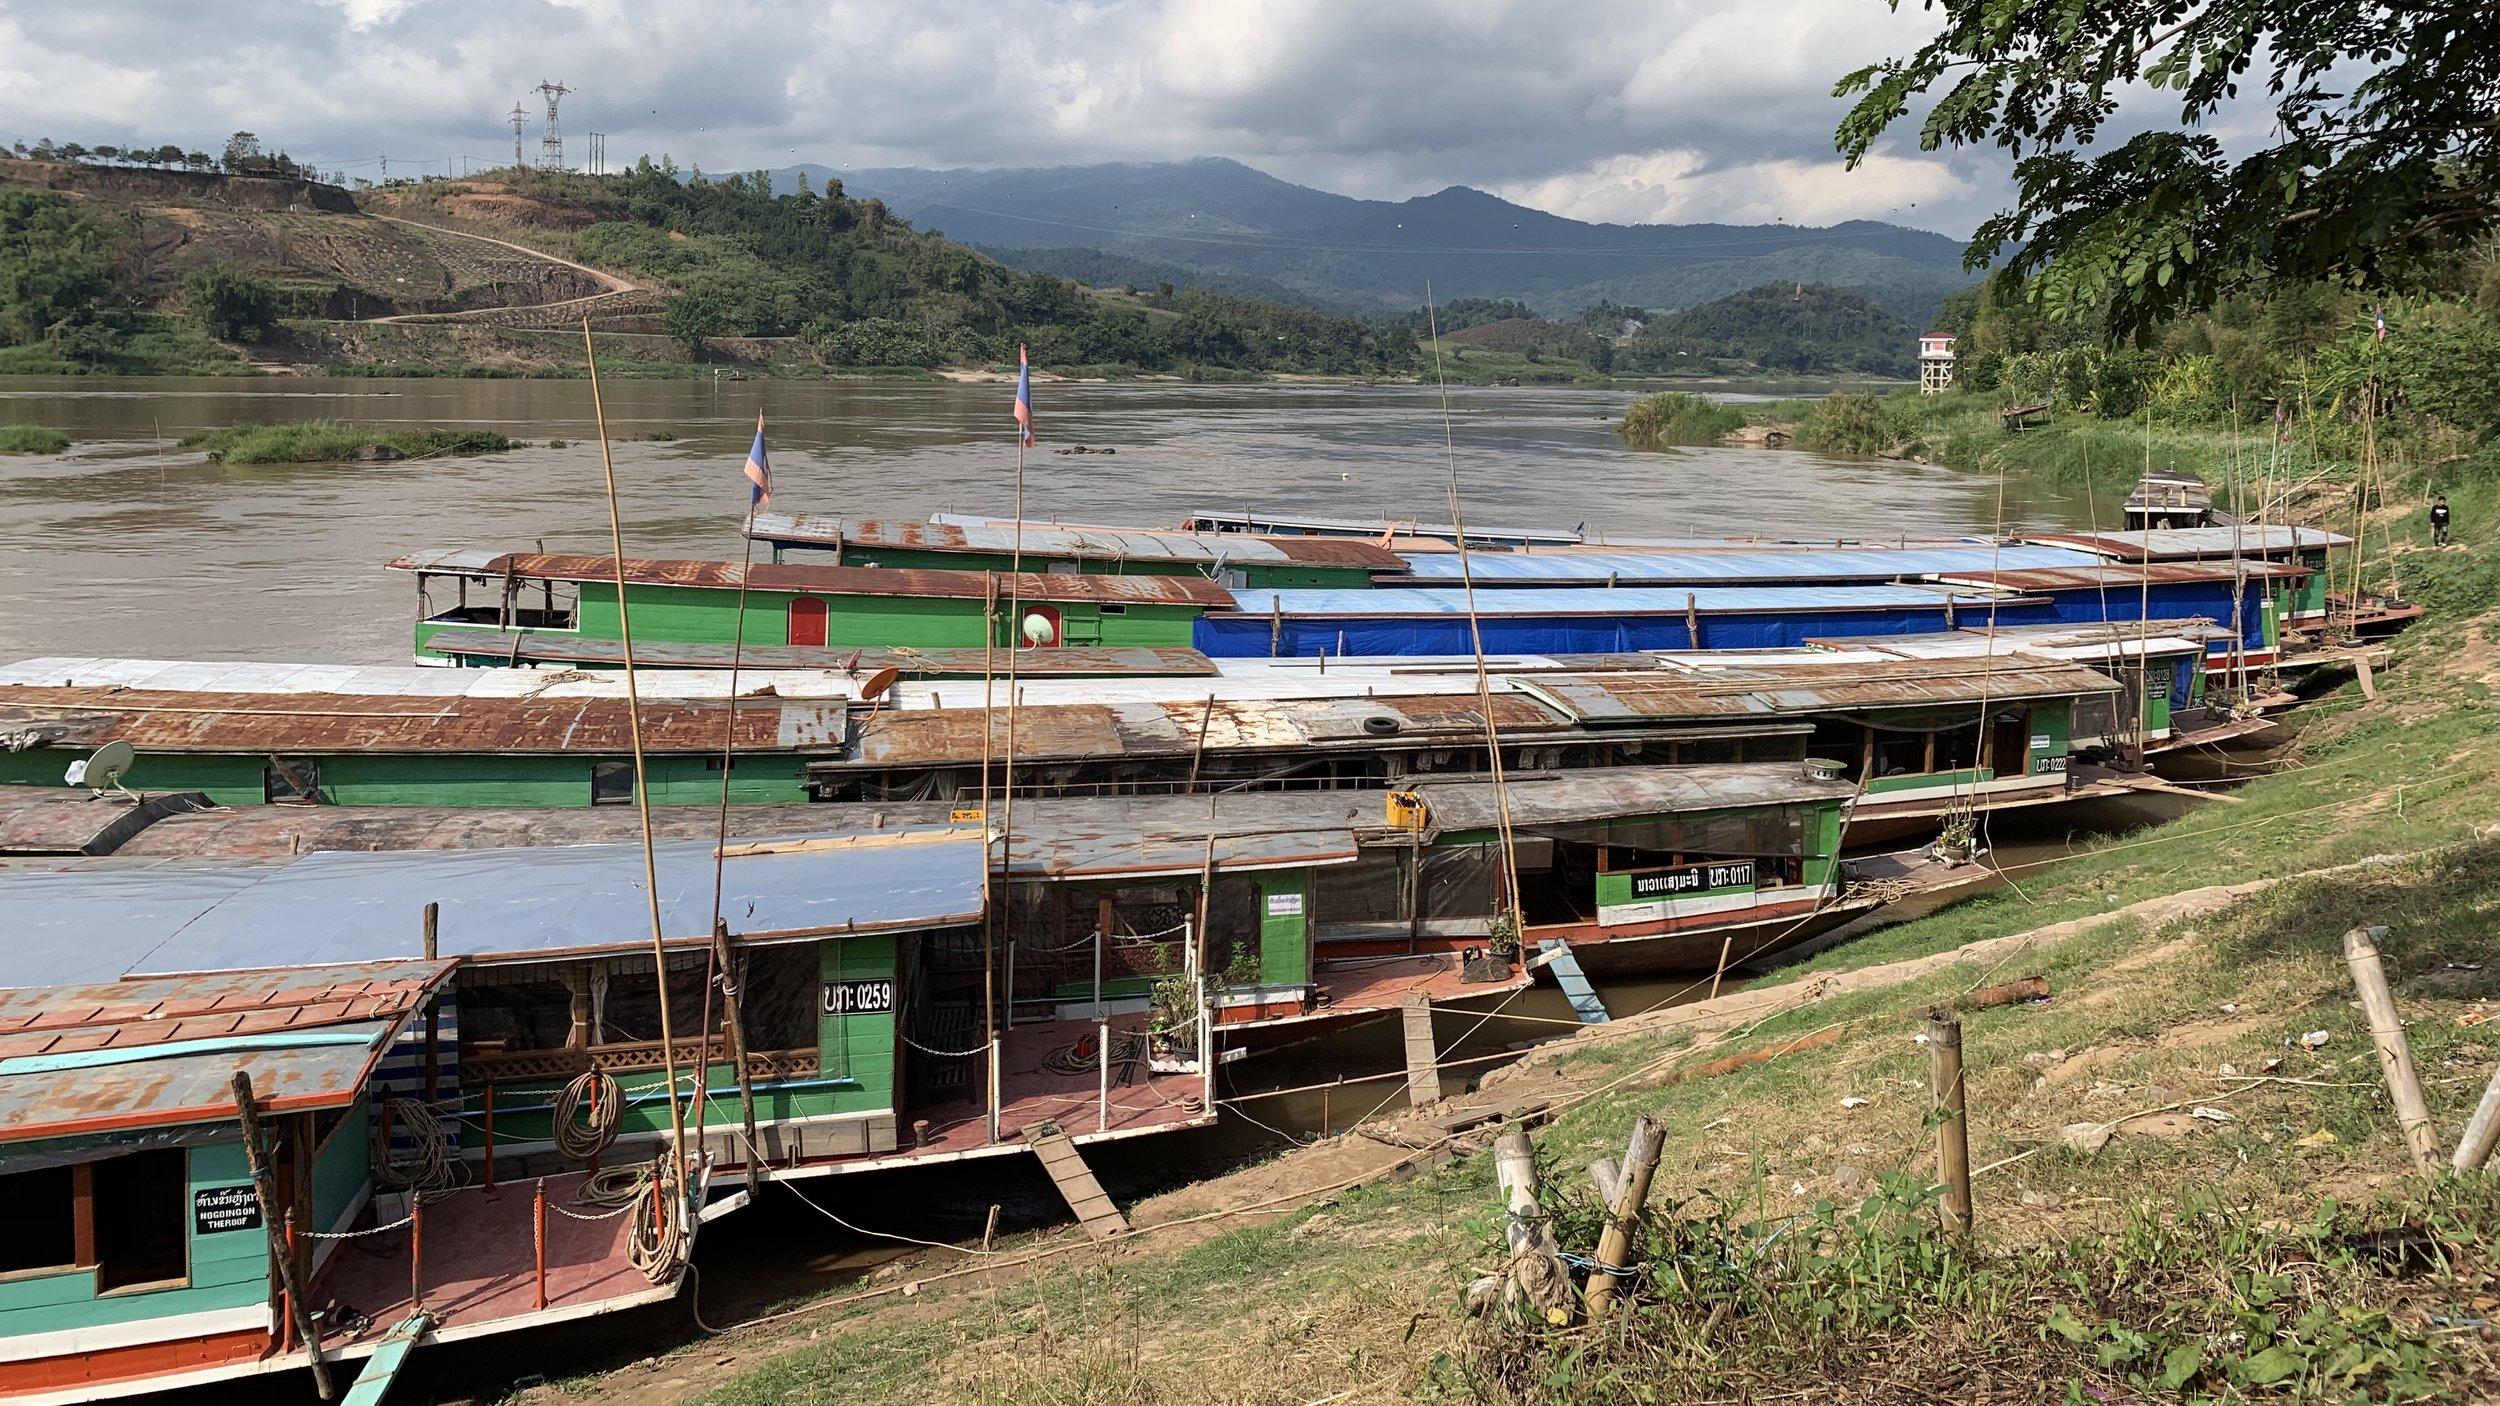 16 - hours on the Mekong River via slowboat